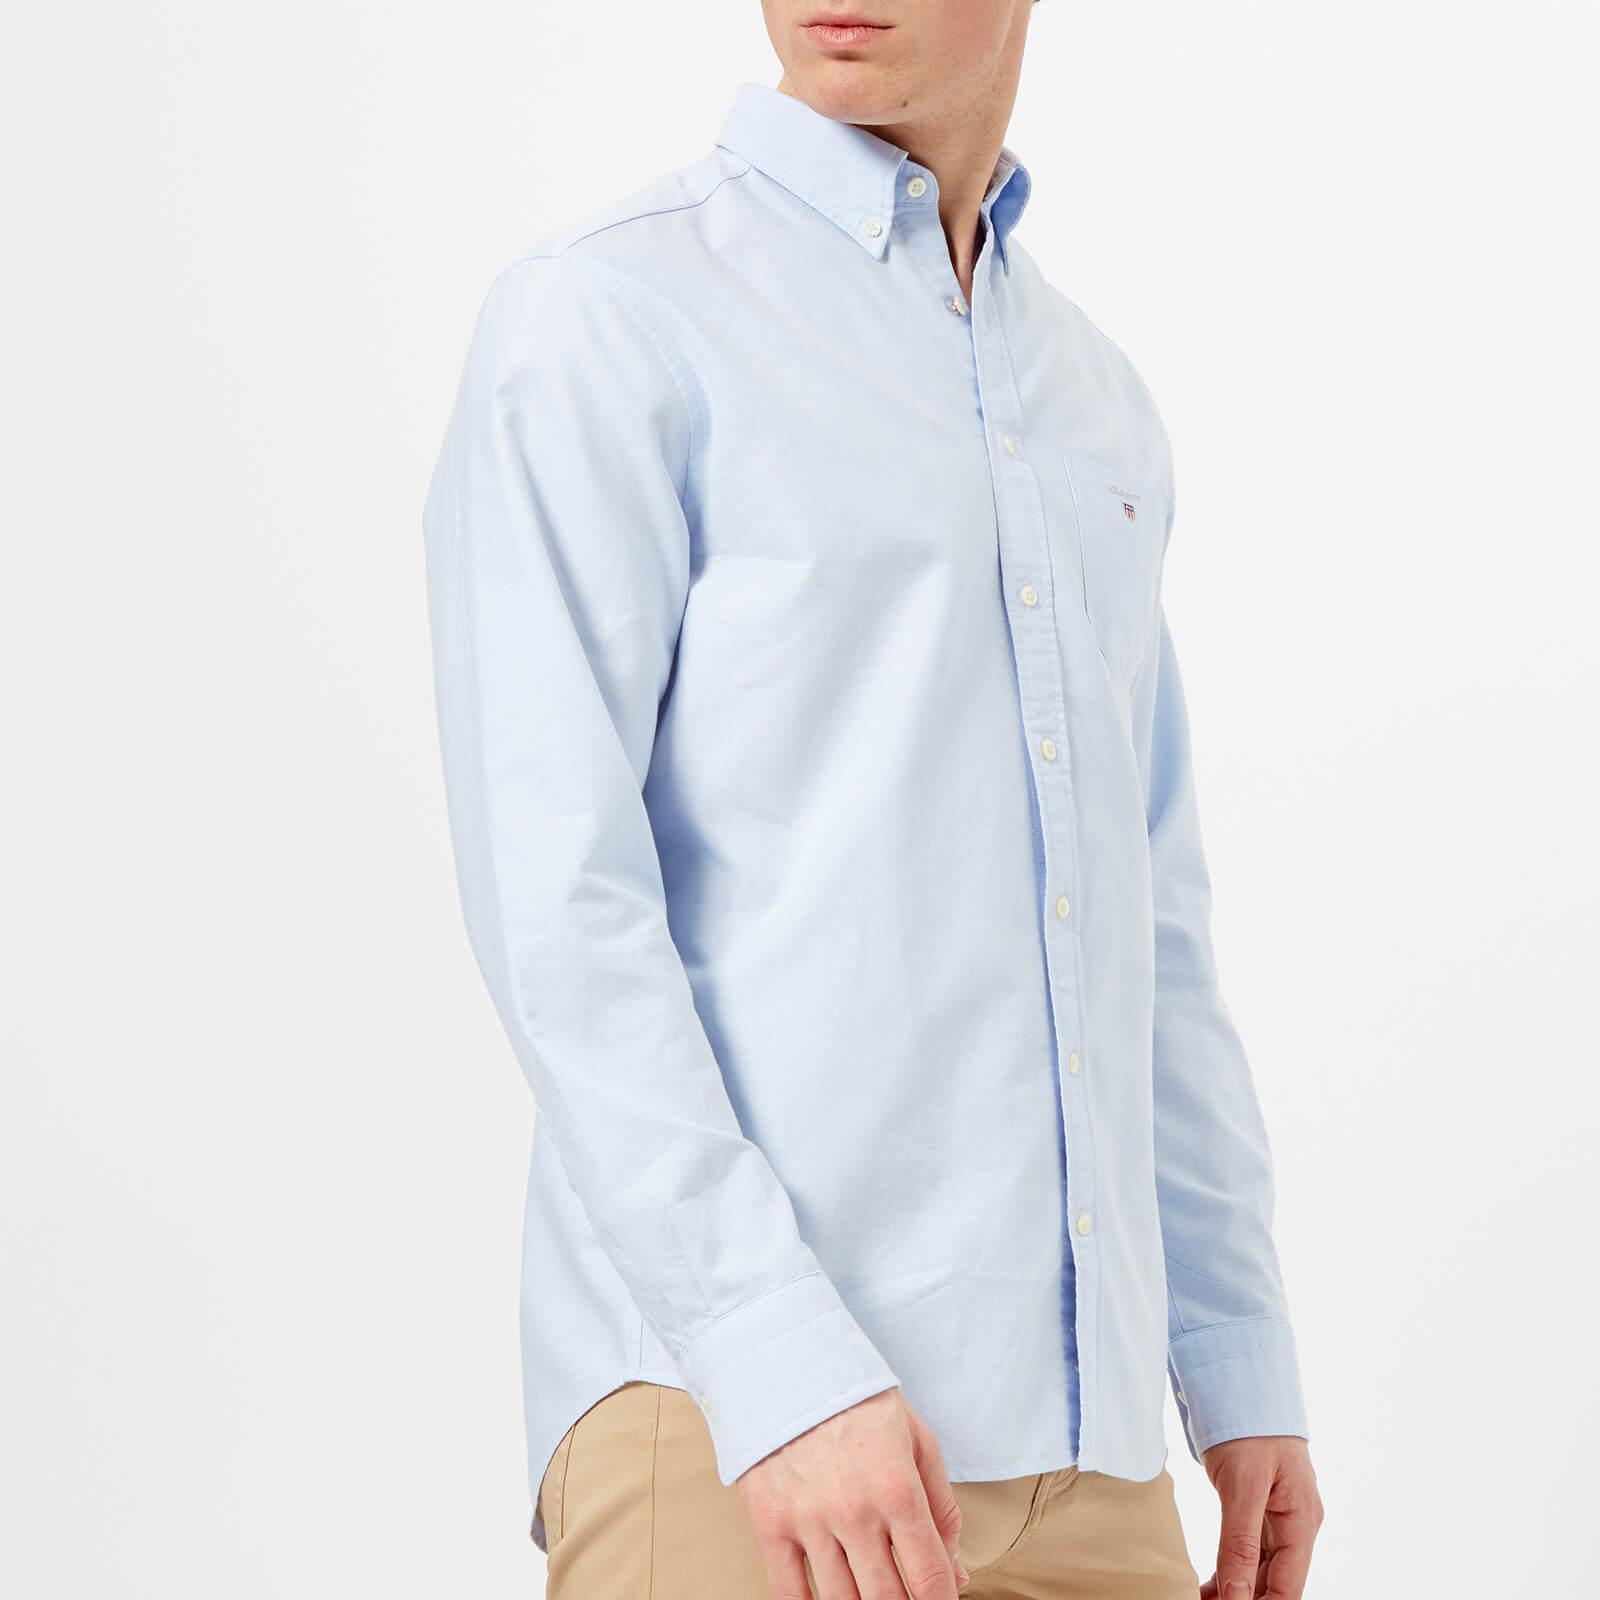 GANT Men's Oxford Long Sleeve Shirt - Capri Blue - M - Blue